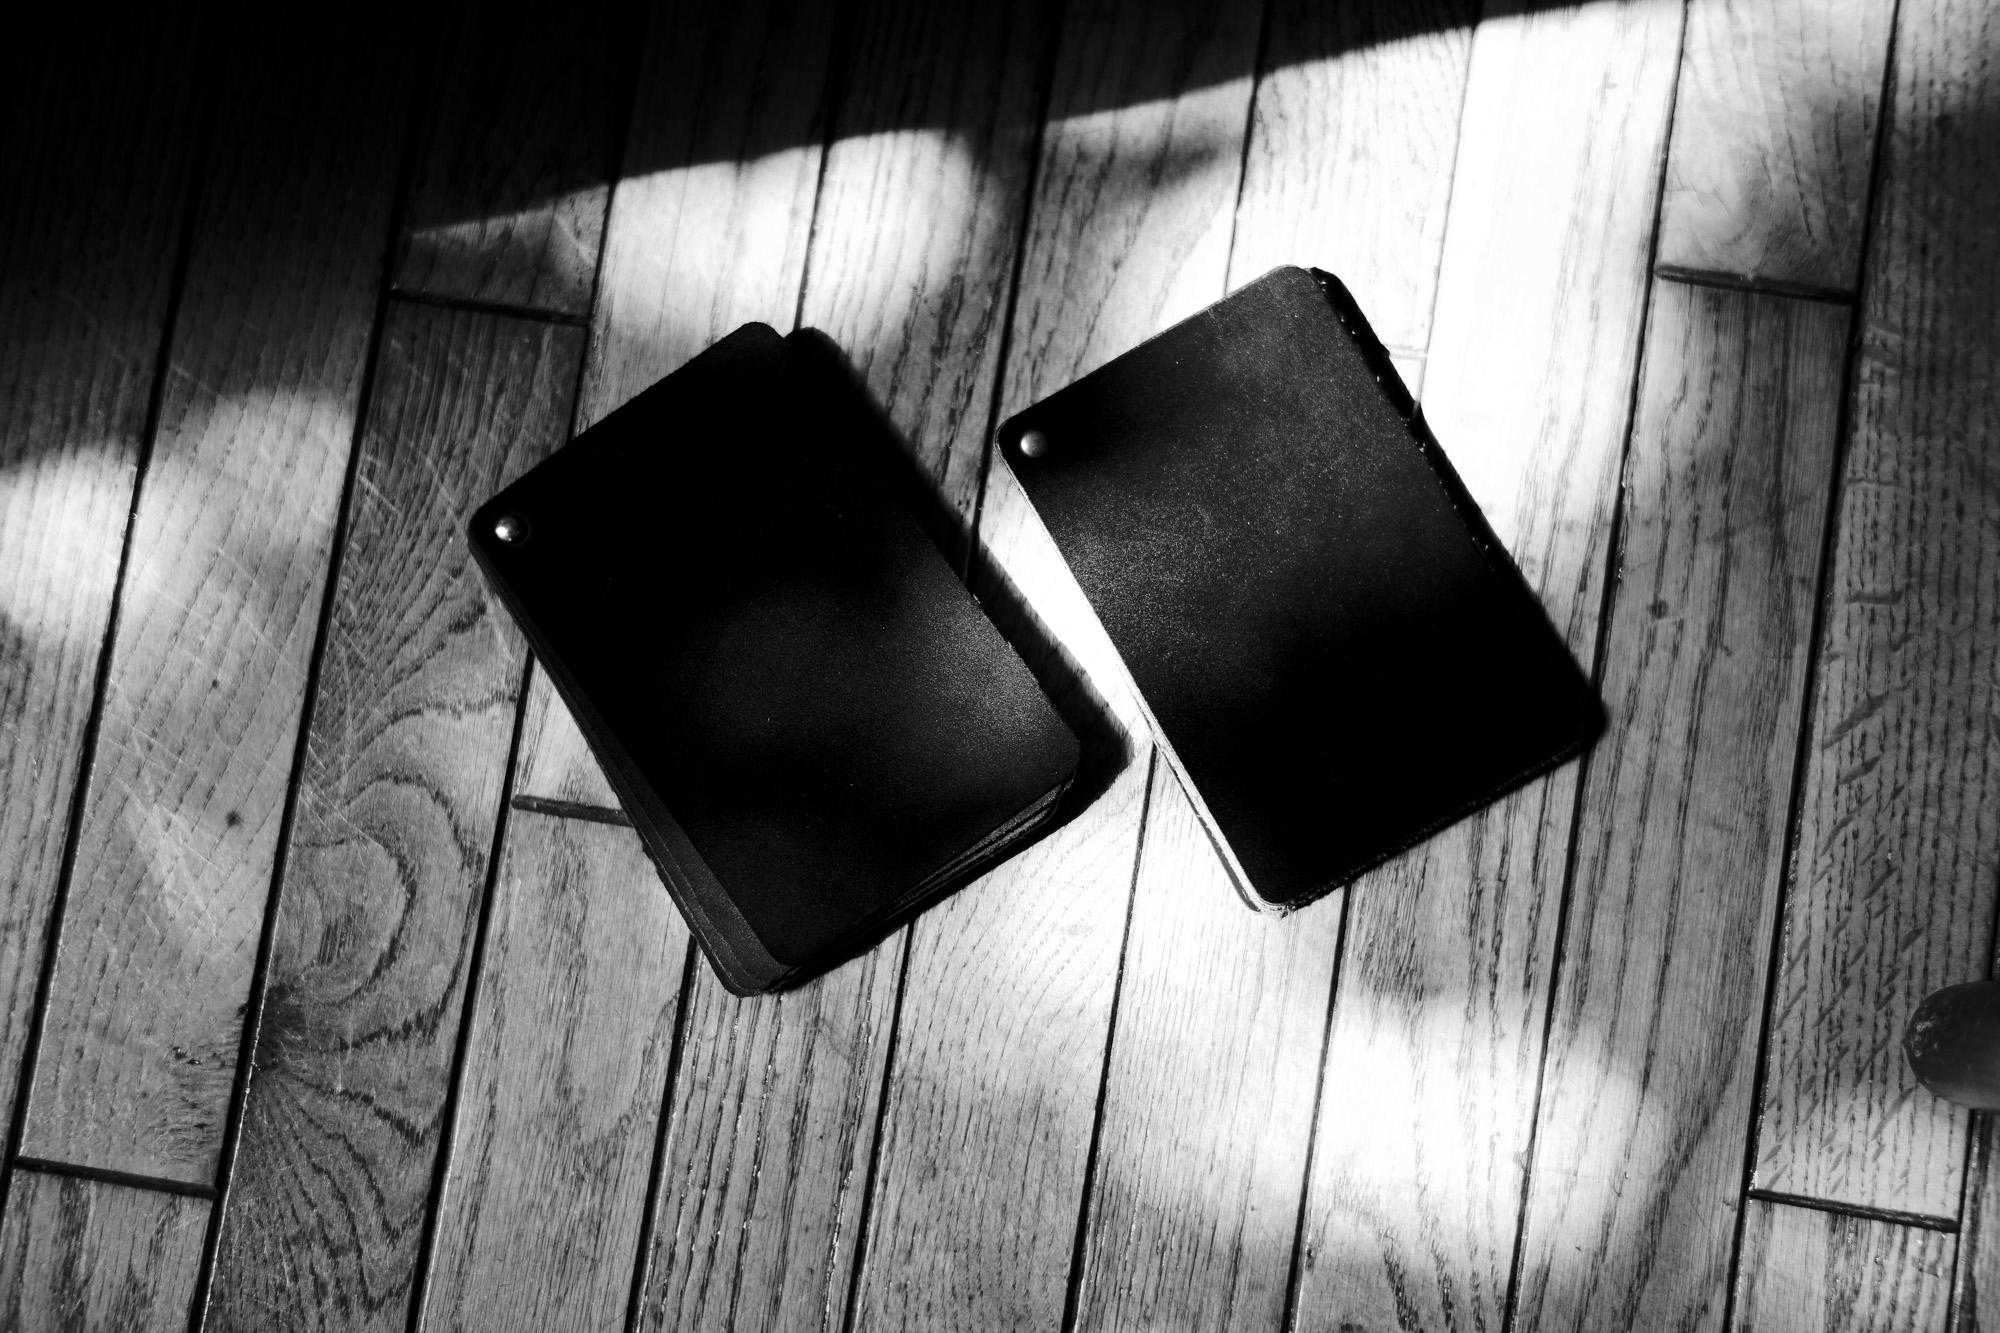 "Yohei Fukuda // ""3 Eyelet Chukka Boots"" Black Calf Leather BLACK 【Alto e Diritto 別注】【Special Model】ヨウヘイフクダ 福田洋平 3アイレット チャッカブーツ ブラックカーフレザー ブラック アルトエデリット別注 スペシャルモデル シューツリー込み UK4.5E~UK9.5E 愛知 名古屋 Alto e Diritto altoediritto アルトエデリット ビスポーク MTO 受注会 オーダー会"